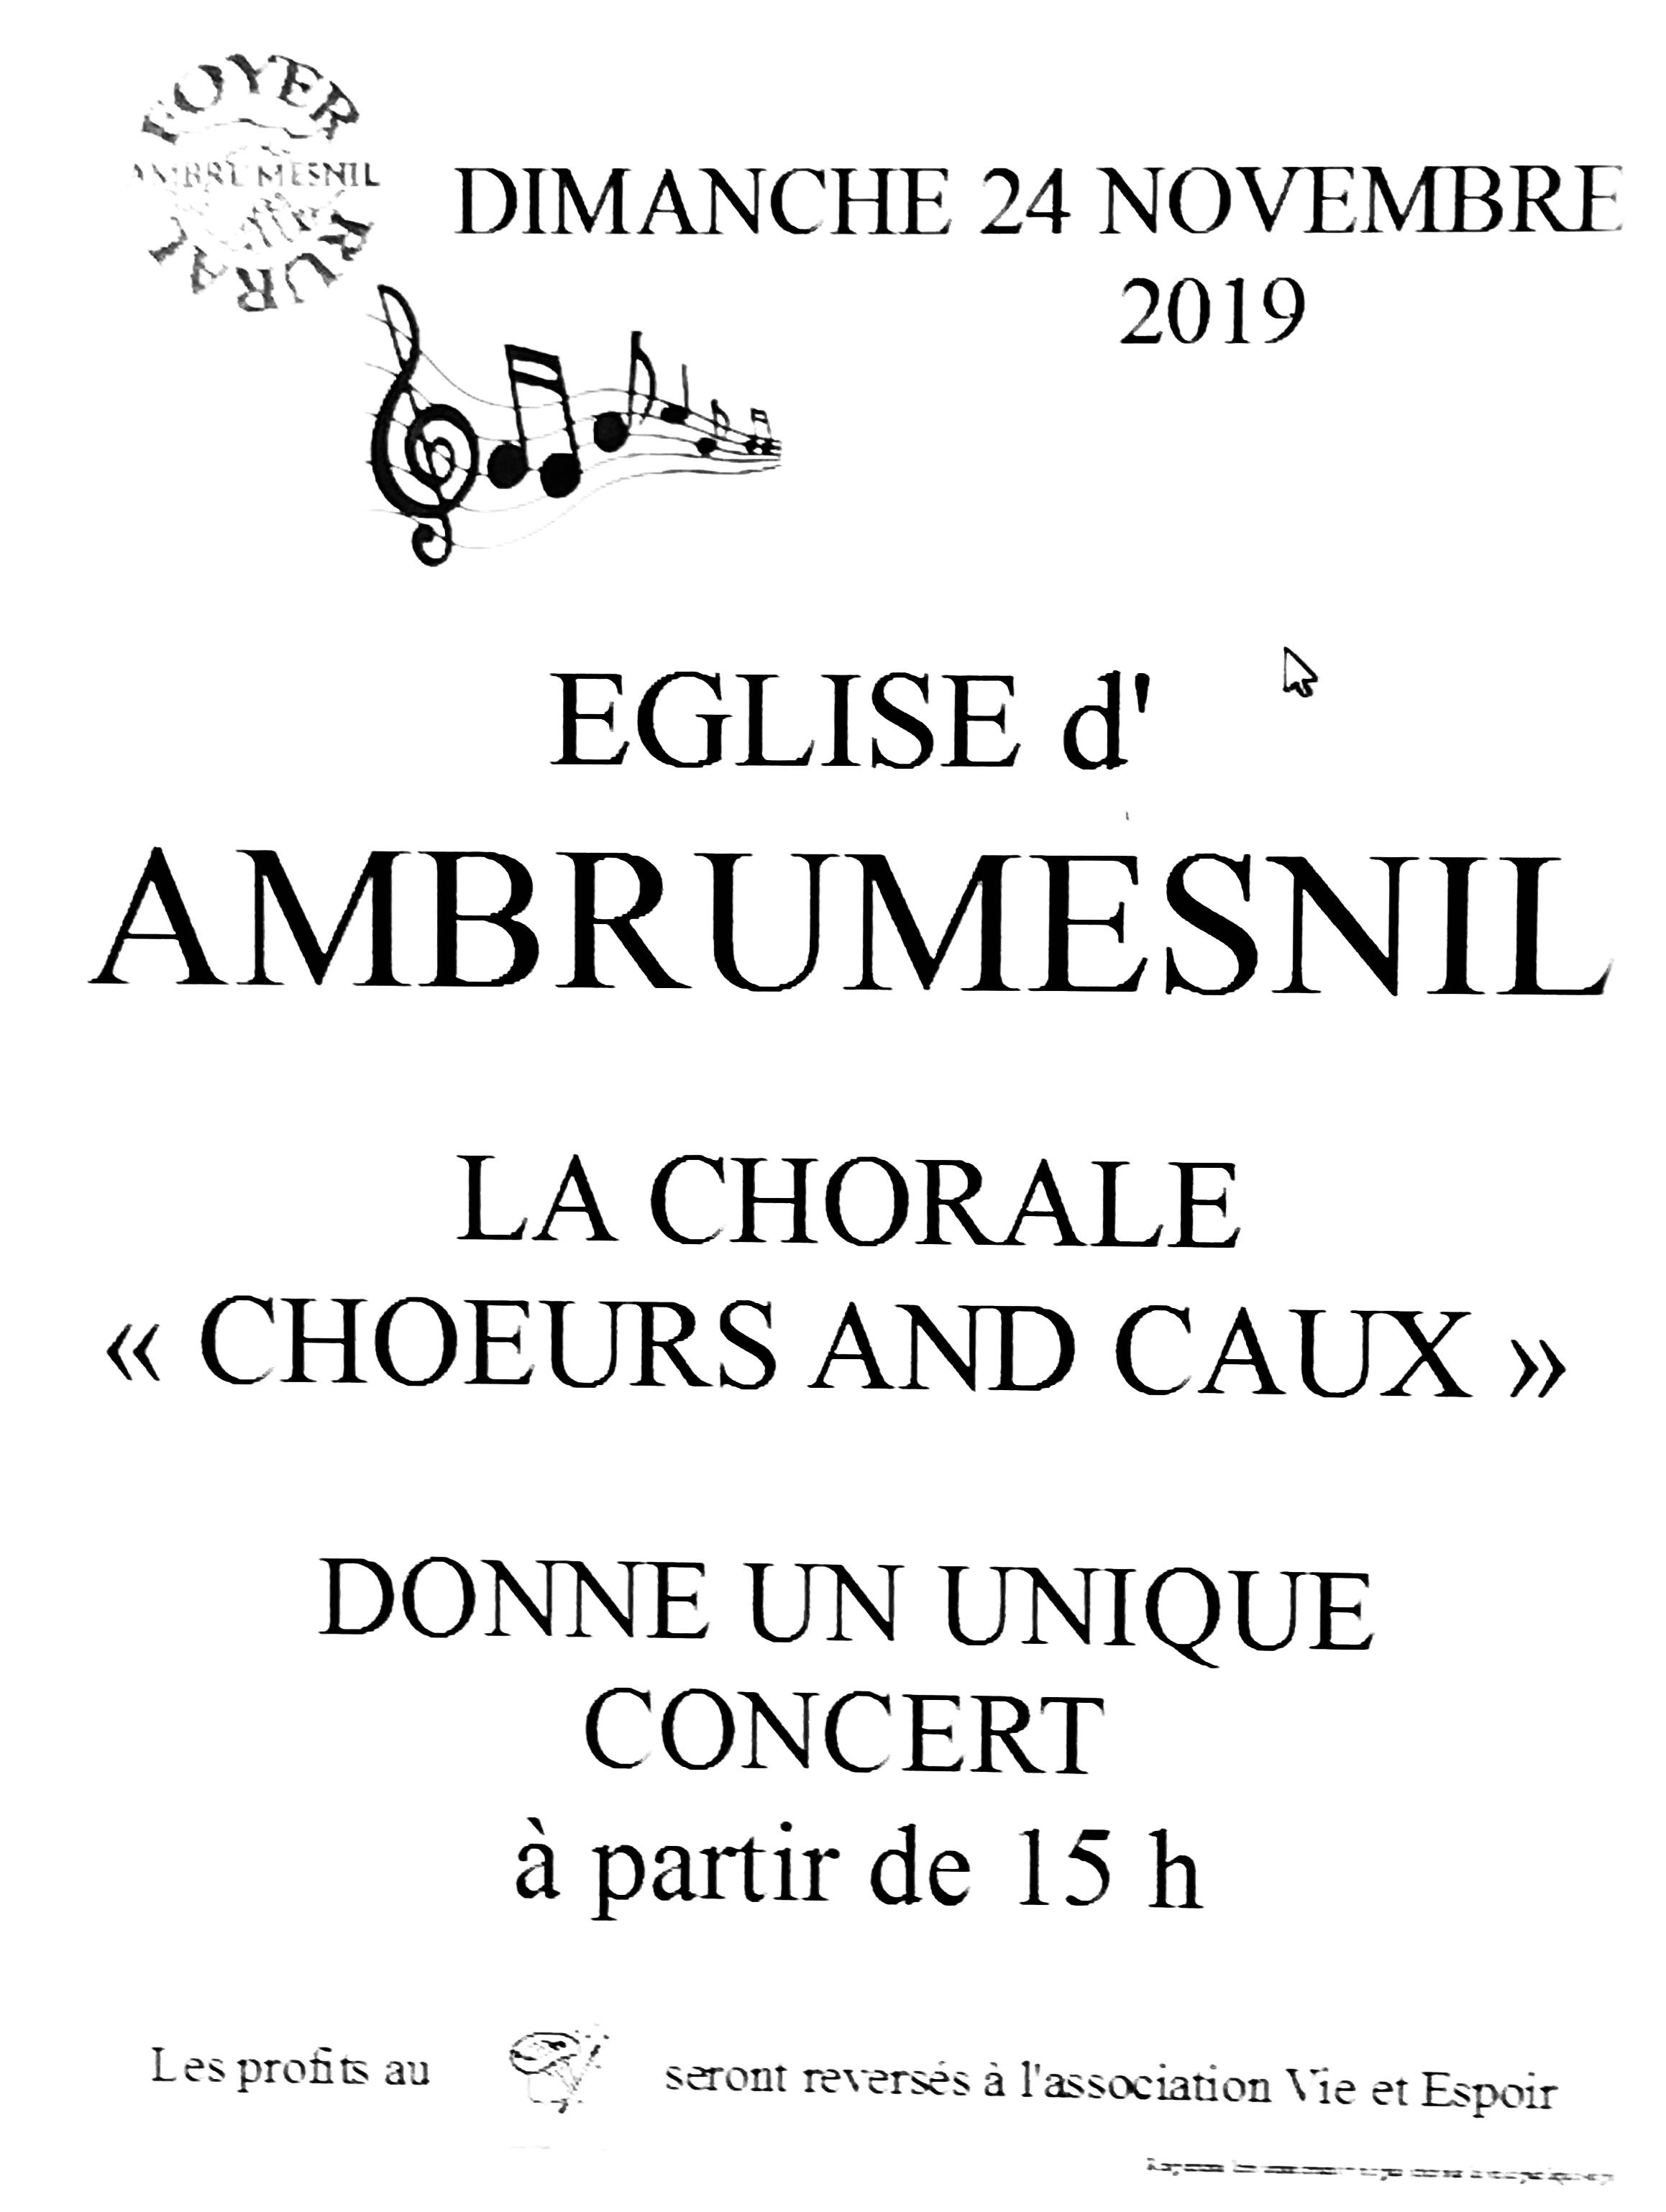 CONCERT  DIMANCHE 24 NOVEMBRE A 15H à Ambrumesnil